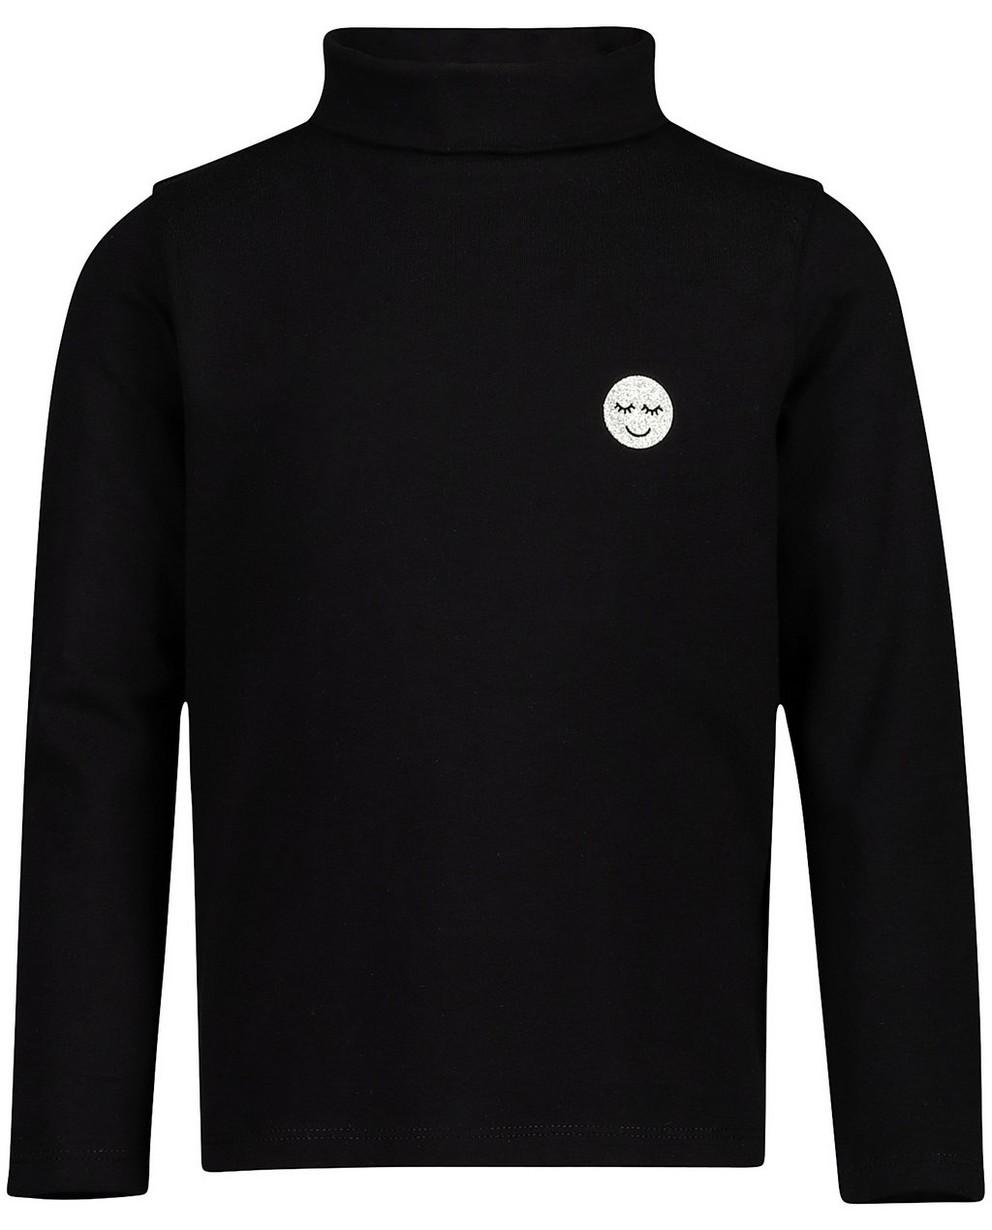 T-shirts - black - Pull col roulé, coton bio